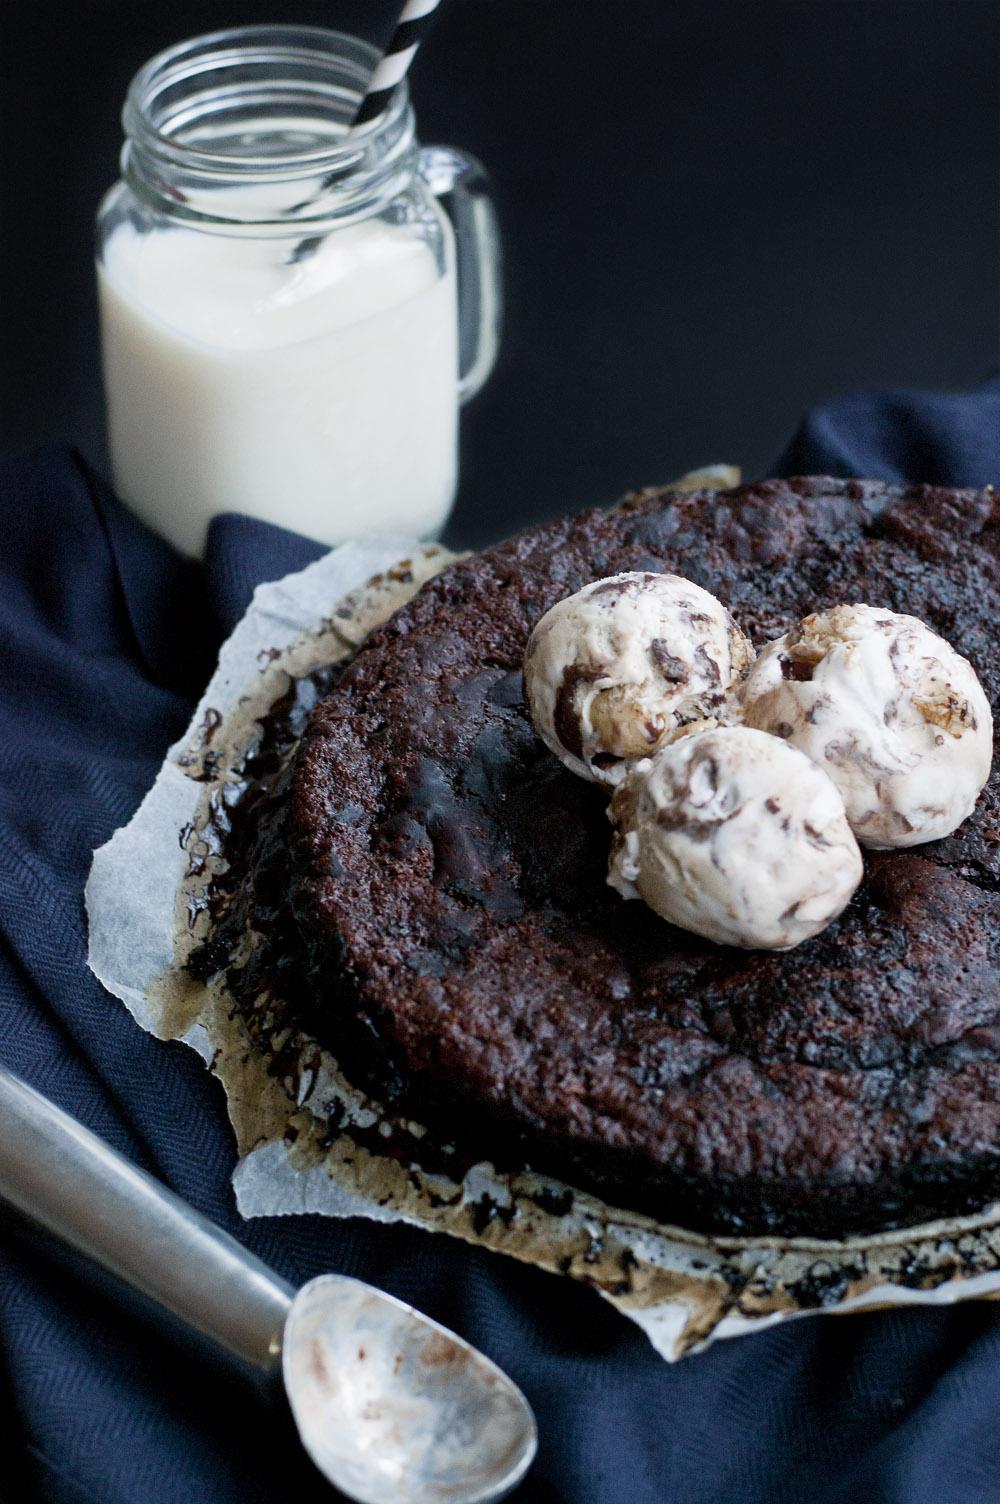 Copenhagencakes Copenhagen Cakes Chocolate Cake Chokoladekage Carte d'Or 2